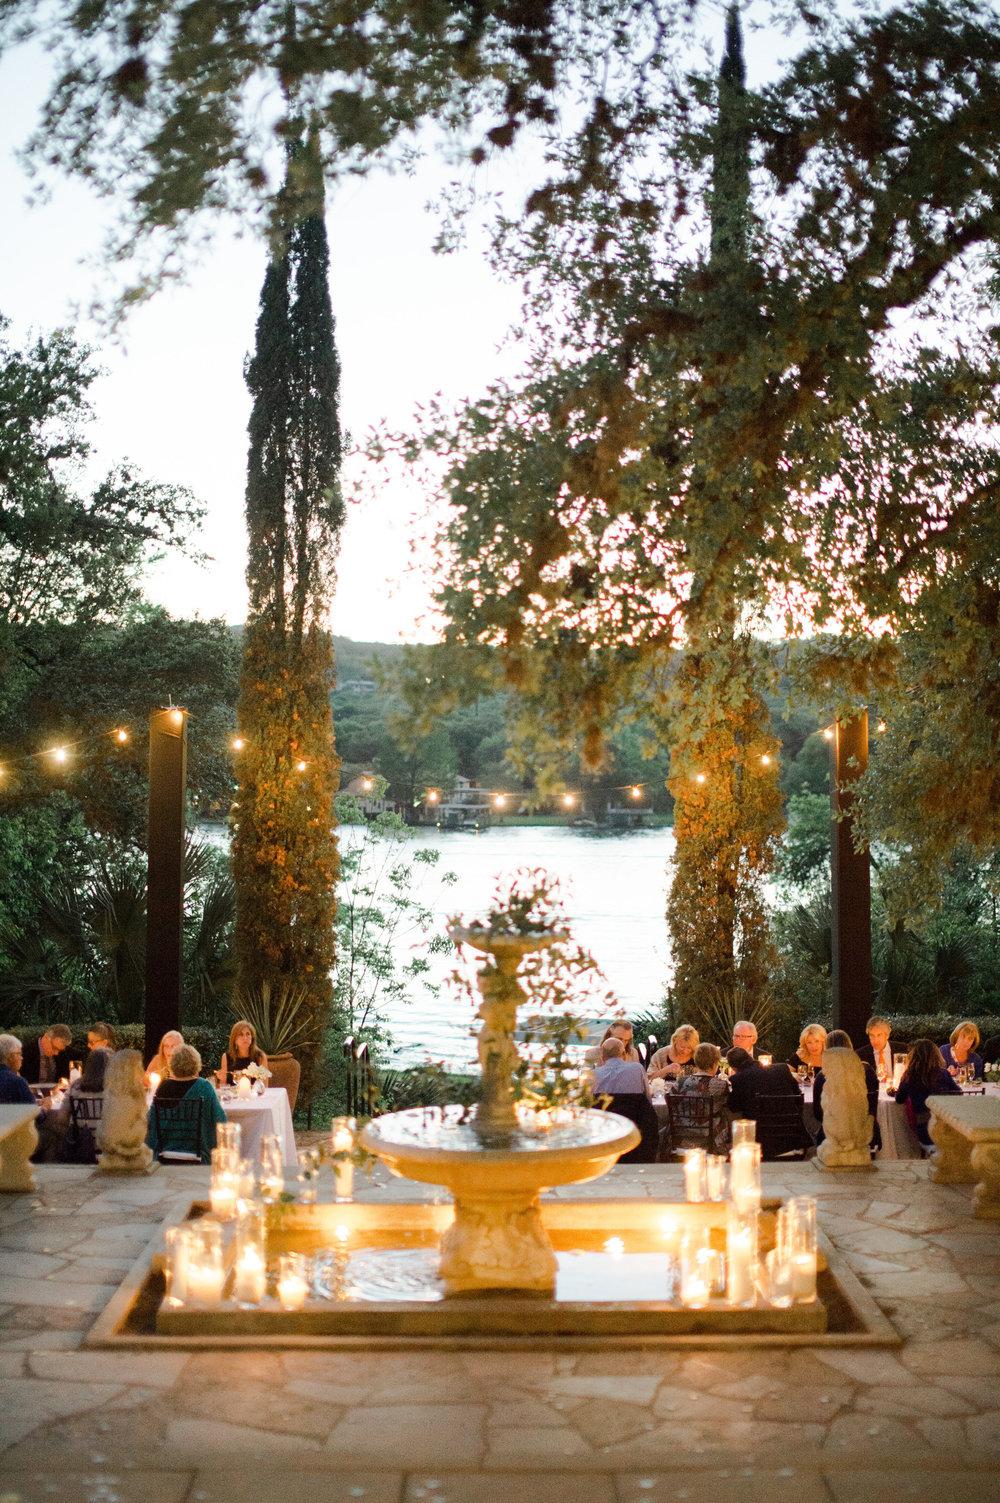 LAGUNA-GLORIA-WEDDING-AUSTIN-MATTHEW-MOORE-PHOTOGRAPHY-00460.jpg